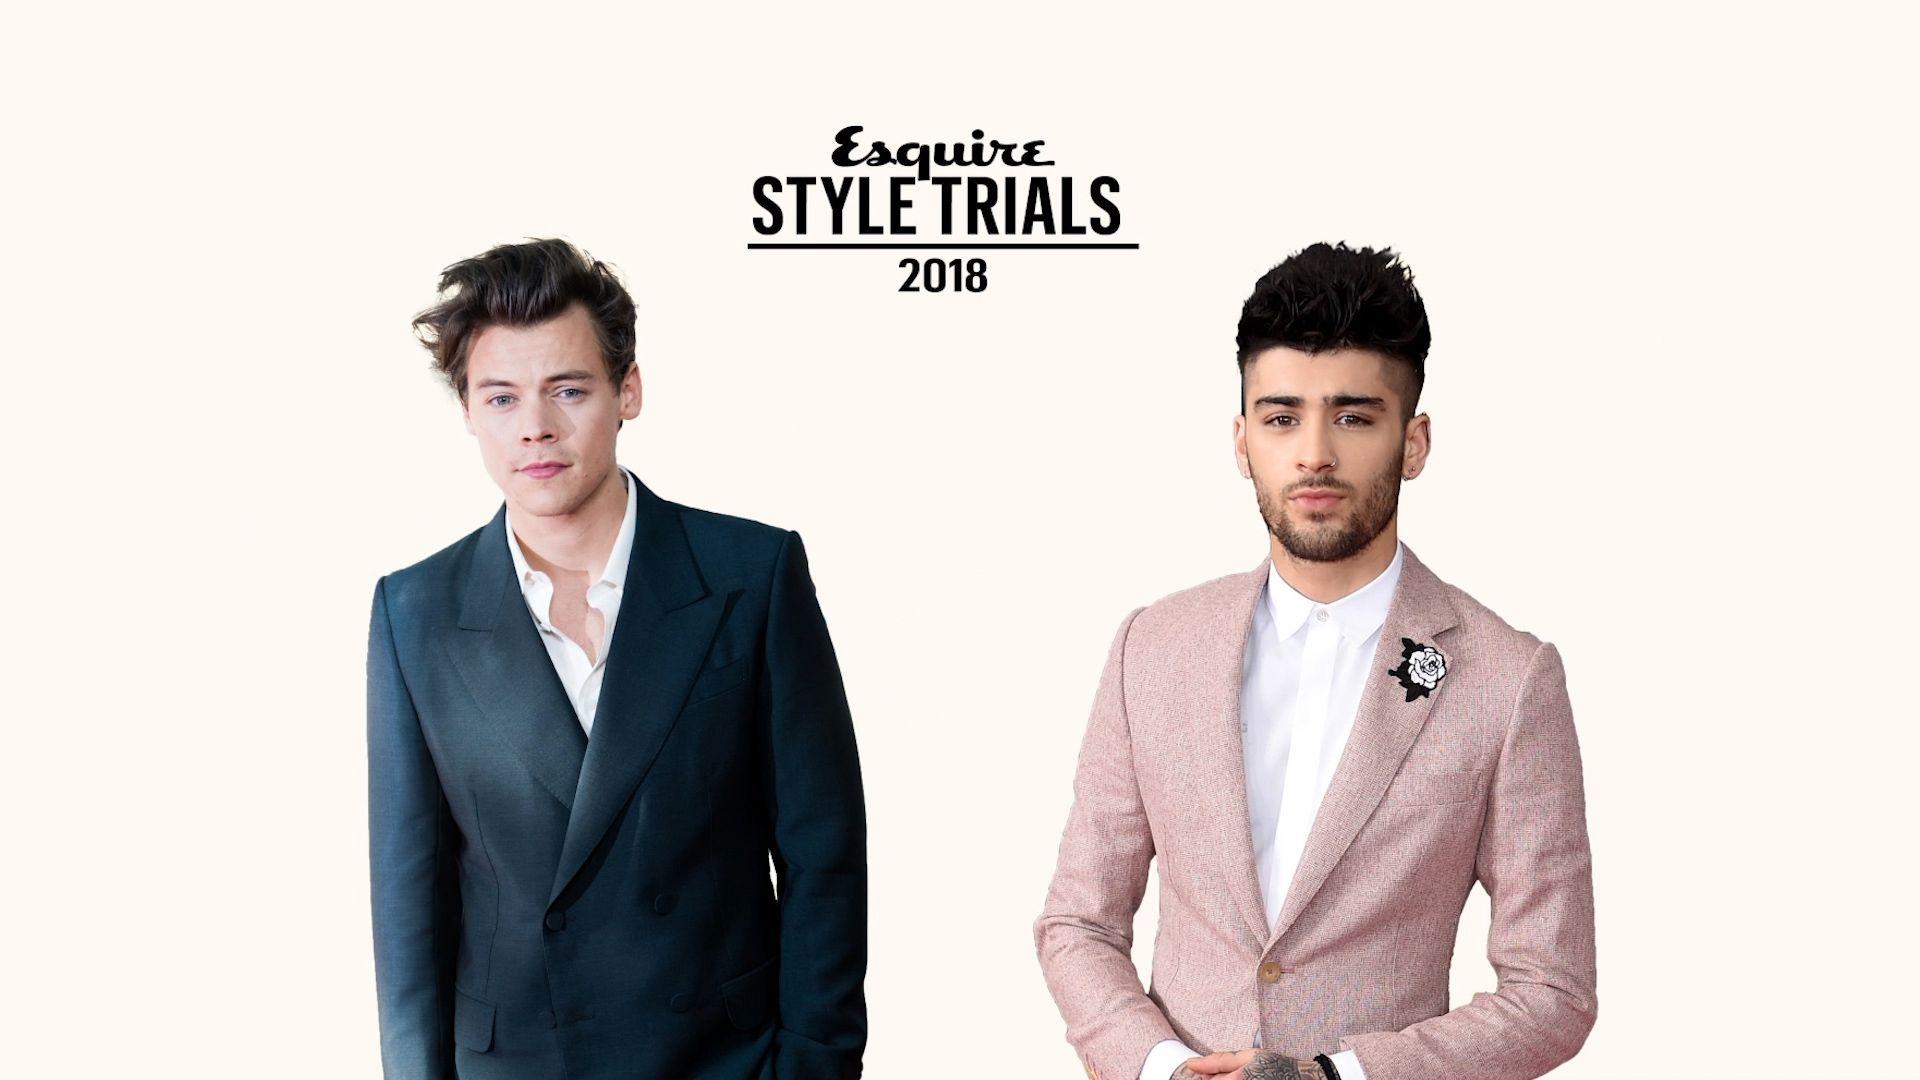 Who Is The Most Stylish Man Of 2018? Quarter Finals: Harry Styles vs. Zayn Malik